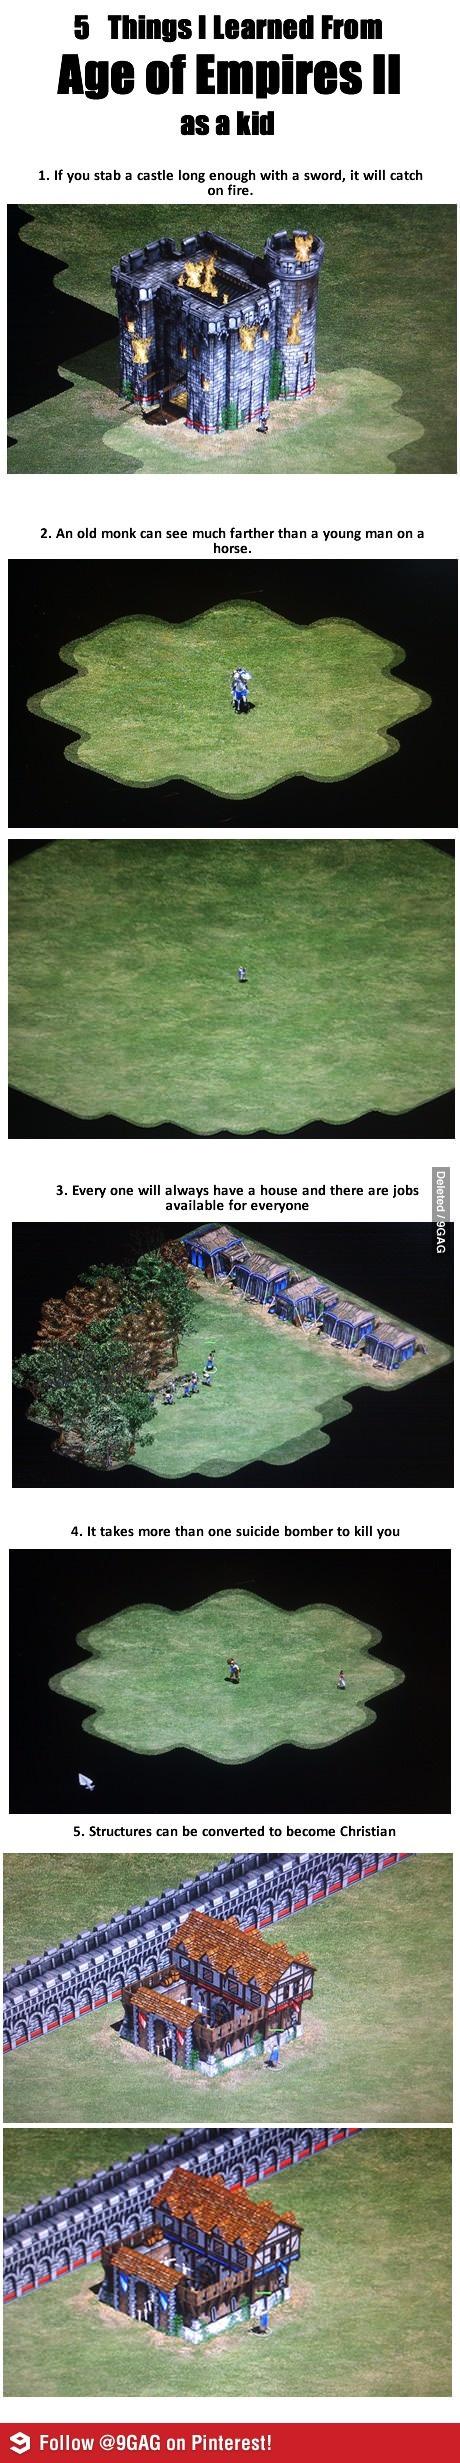 Age of Empires II, this brings back memories